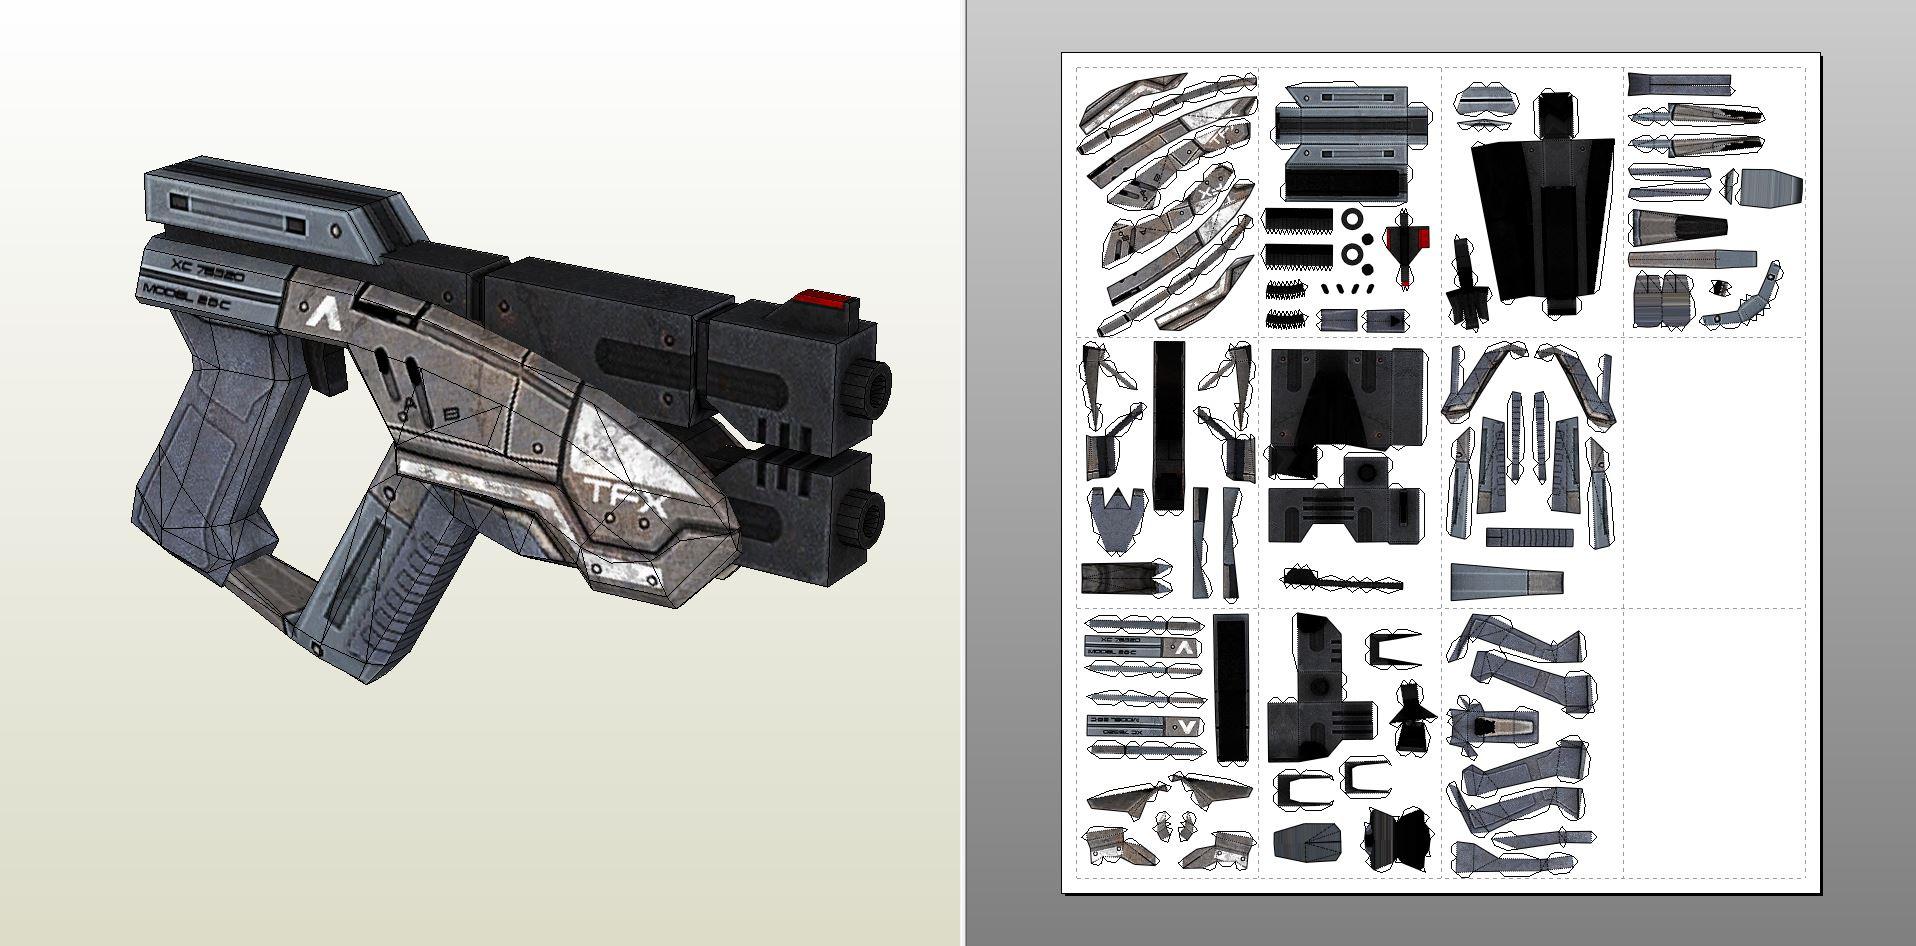 Papercraft .pdo file template for Predator - M3 Pistol.